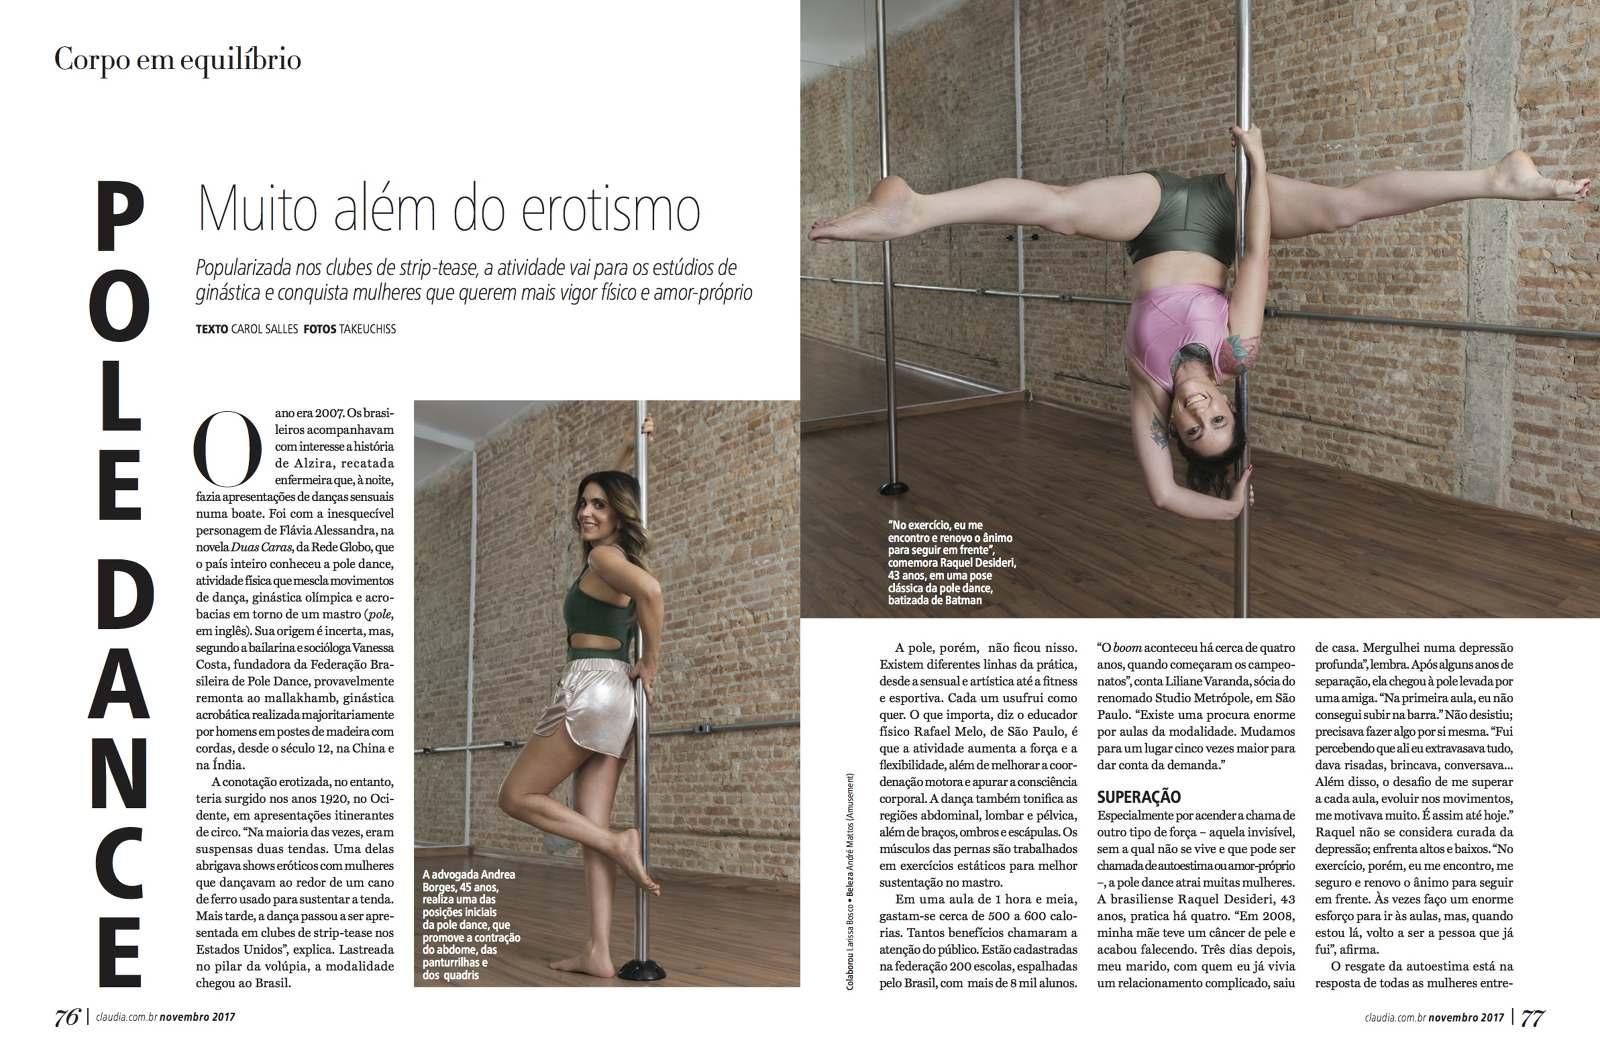 Revista CLAUDIA (oct 16 - actual) - Beatriz Chimelli